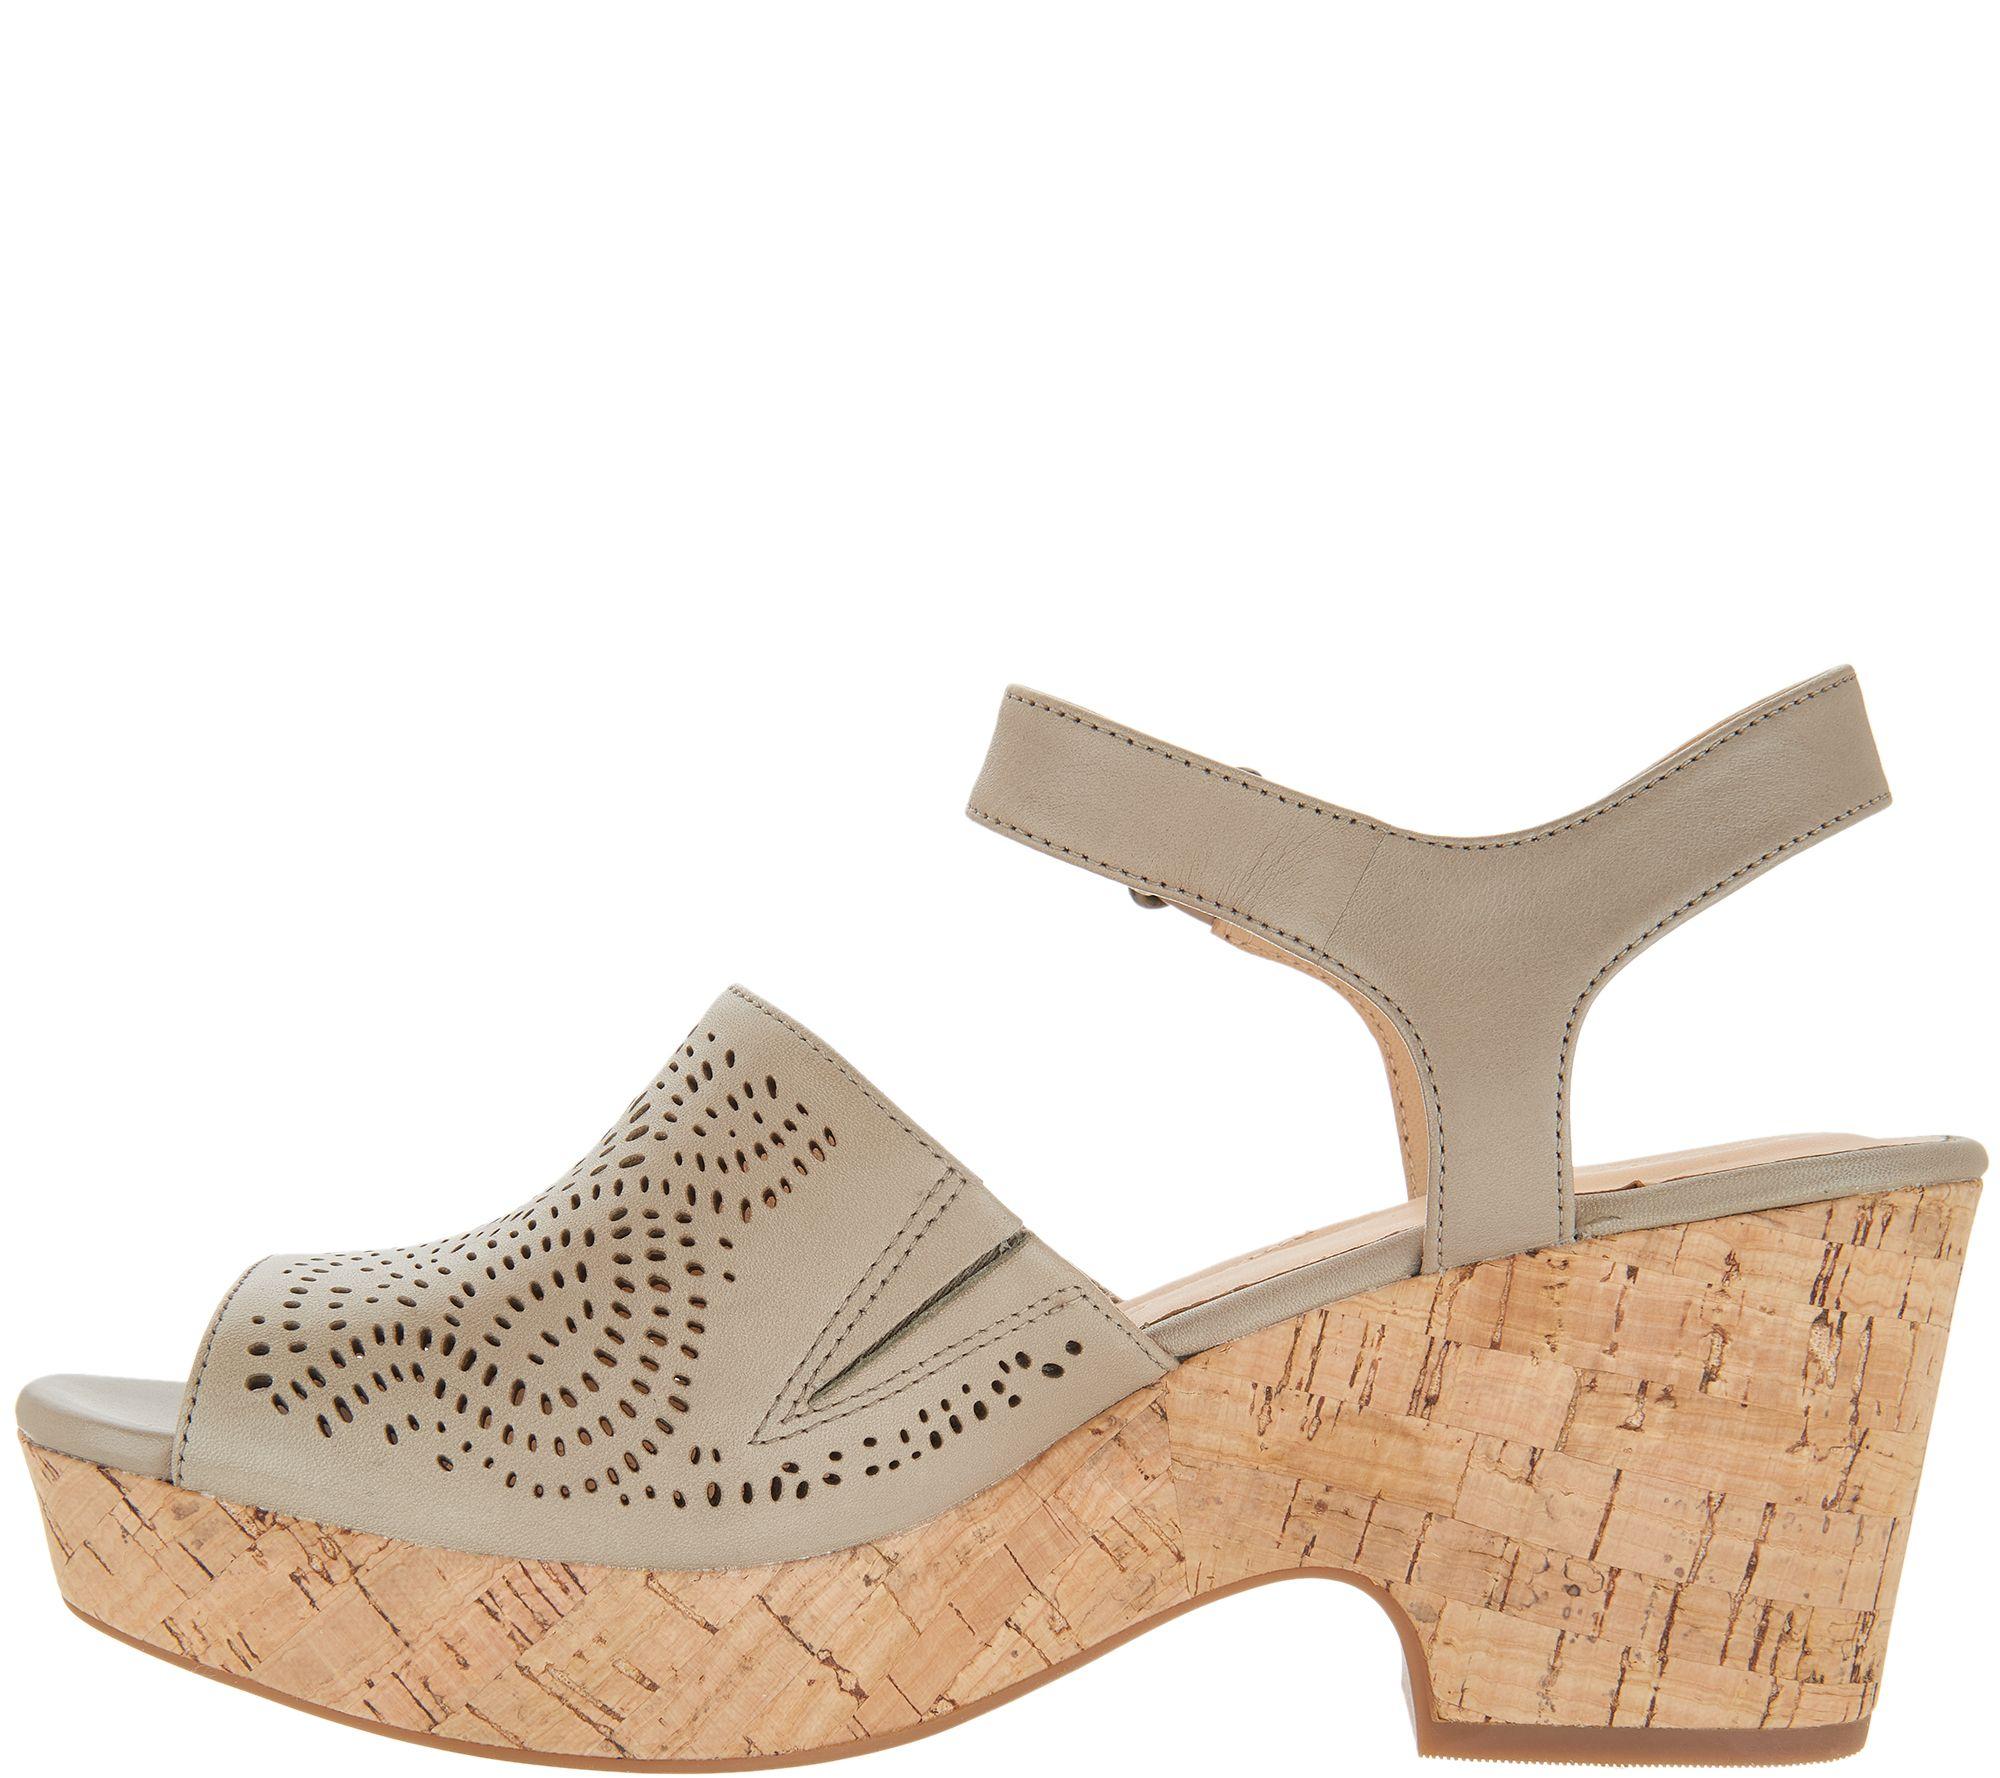 c7b084e8fd6 Clarks Artisan Perforated Leather Wedge Sandals - Maritsa Nila - Page 1 —  QVC.com